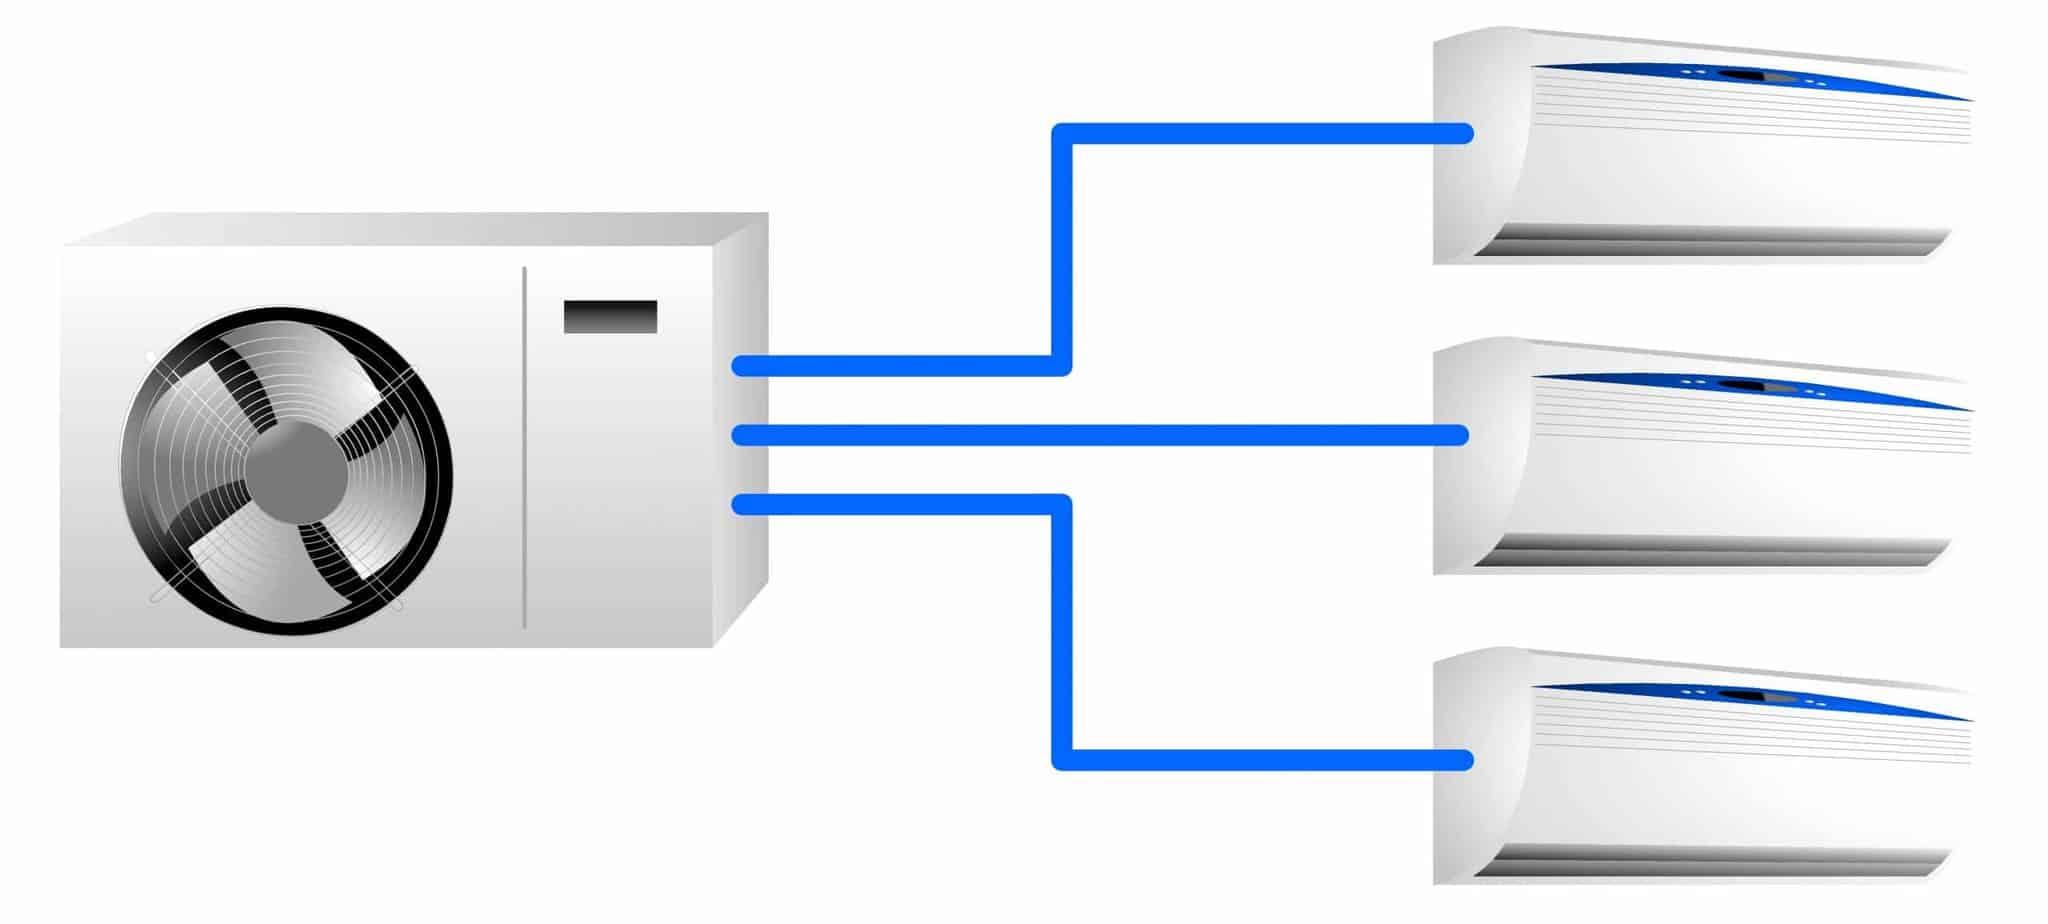 sistemas multi split aire aocndiciondo